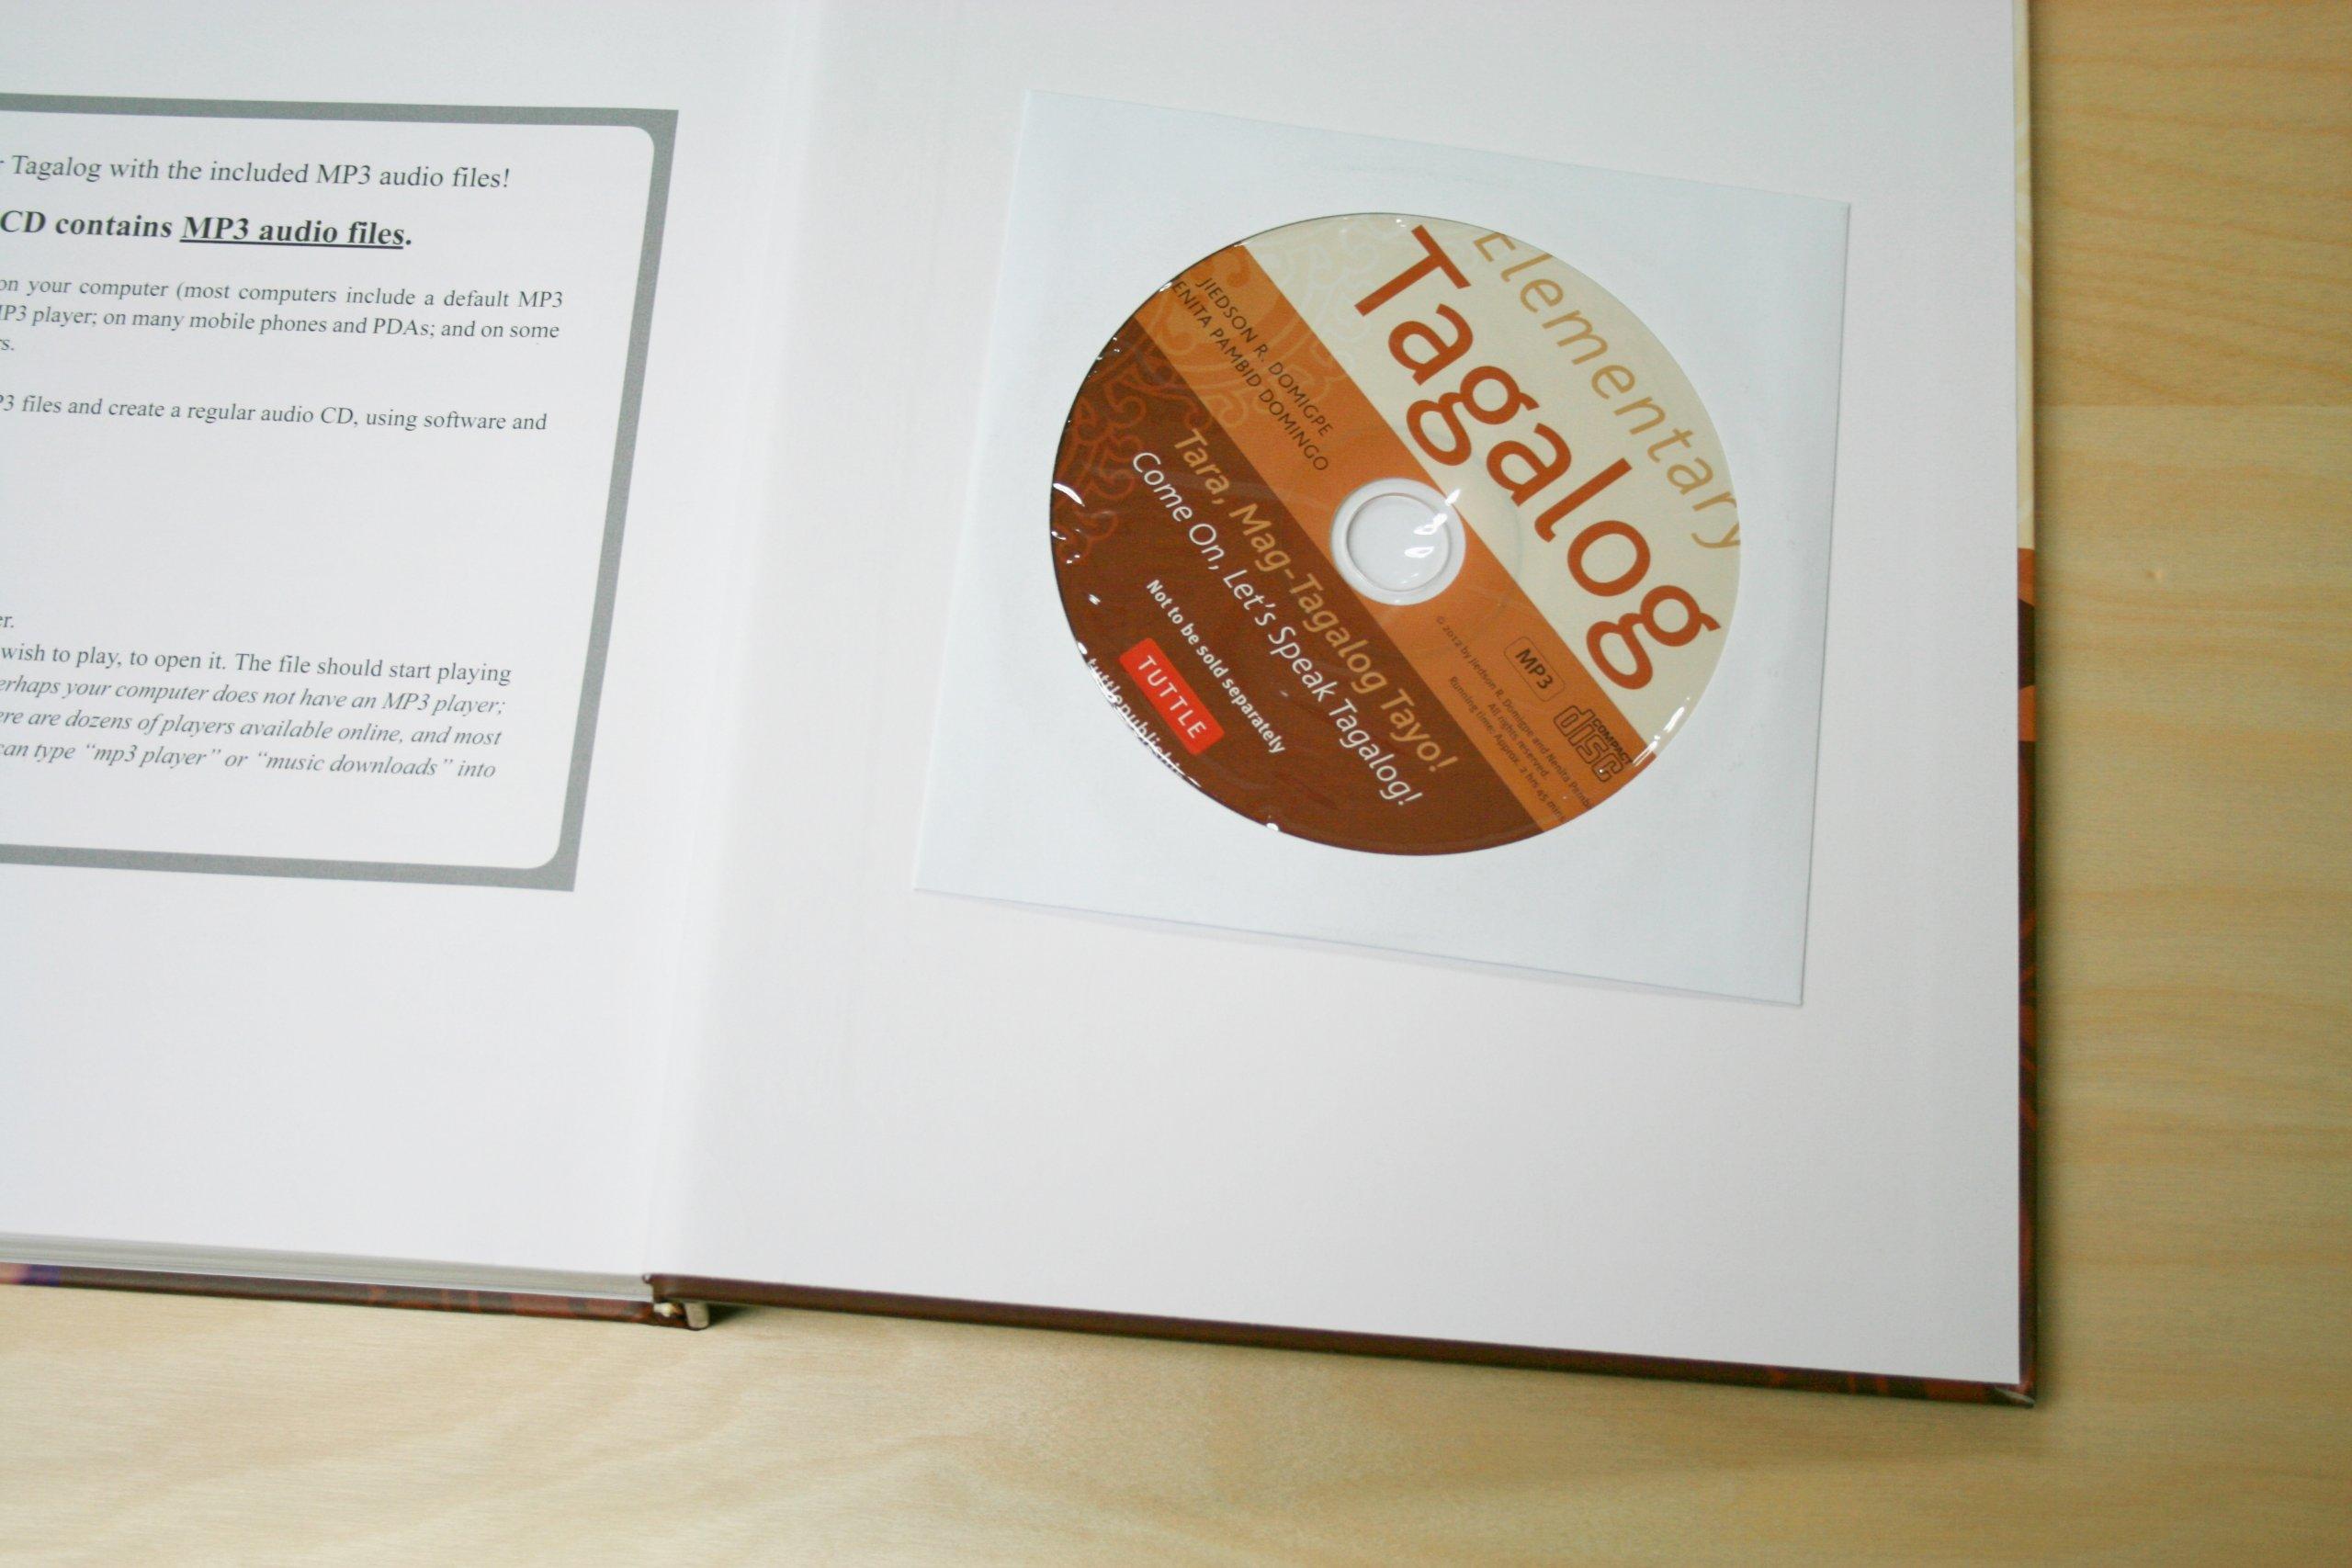 Knitting Meaning In Tagalog : Amazon.com: elementary tagalog: tara mag tagalog tayo! come on